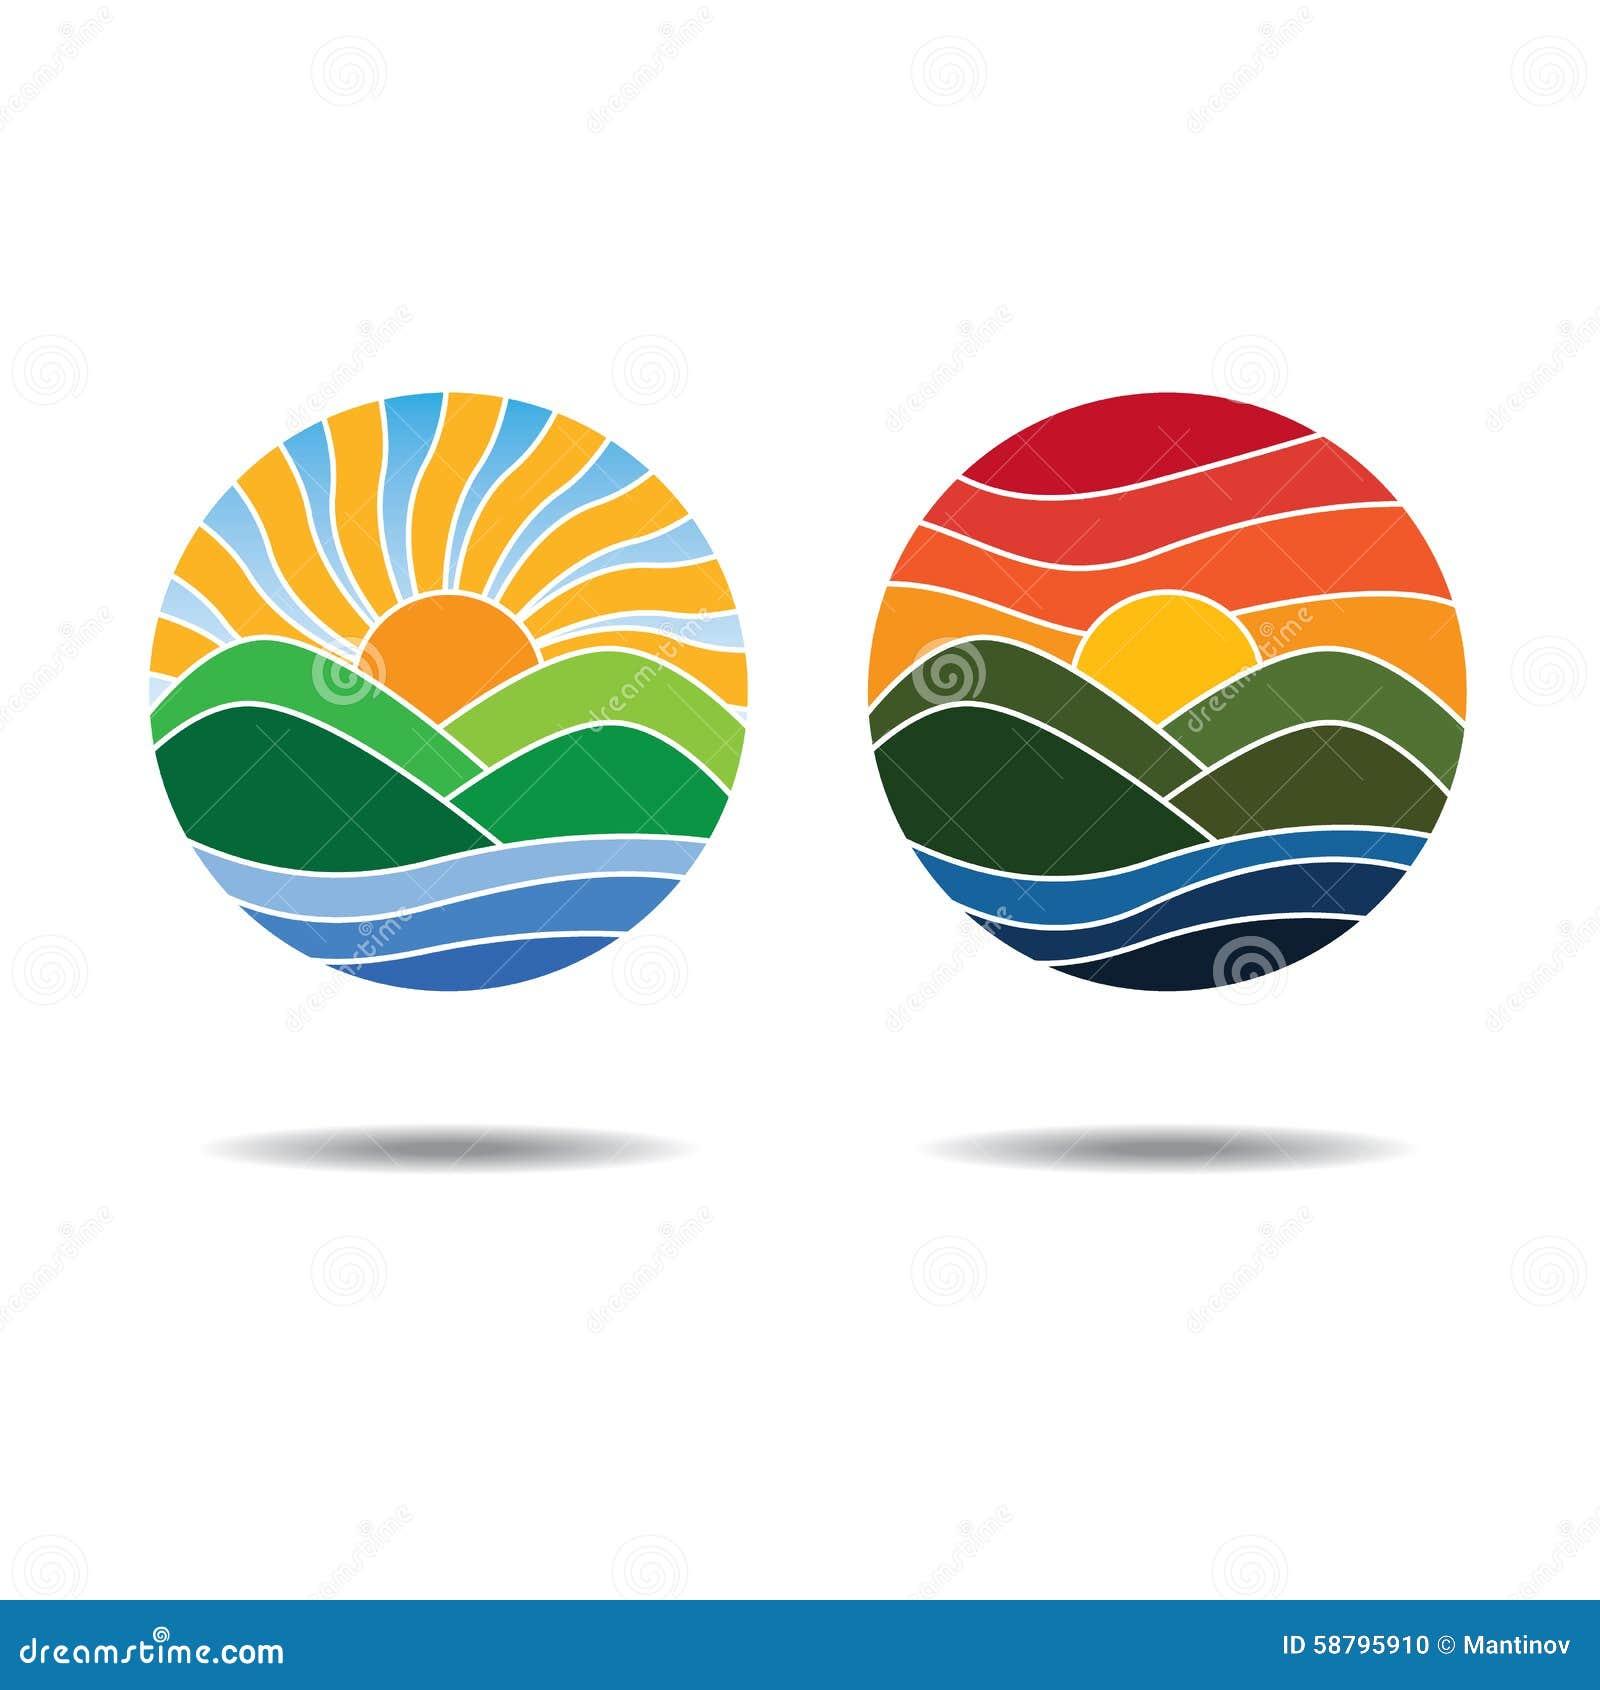 sunrise and sunset logos stock vector illustration of